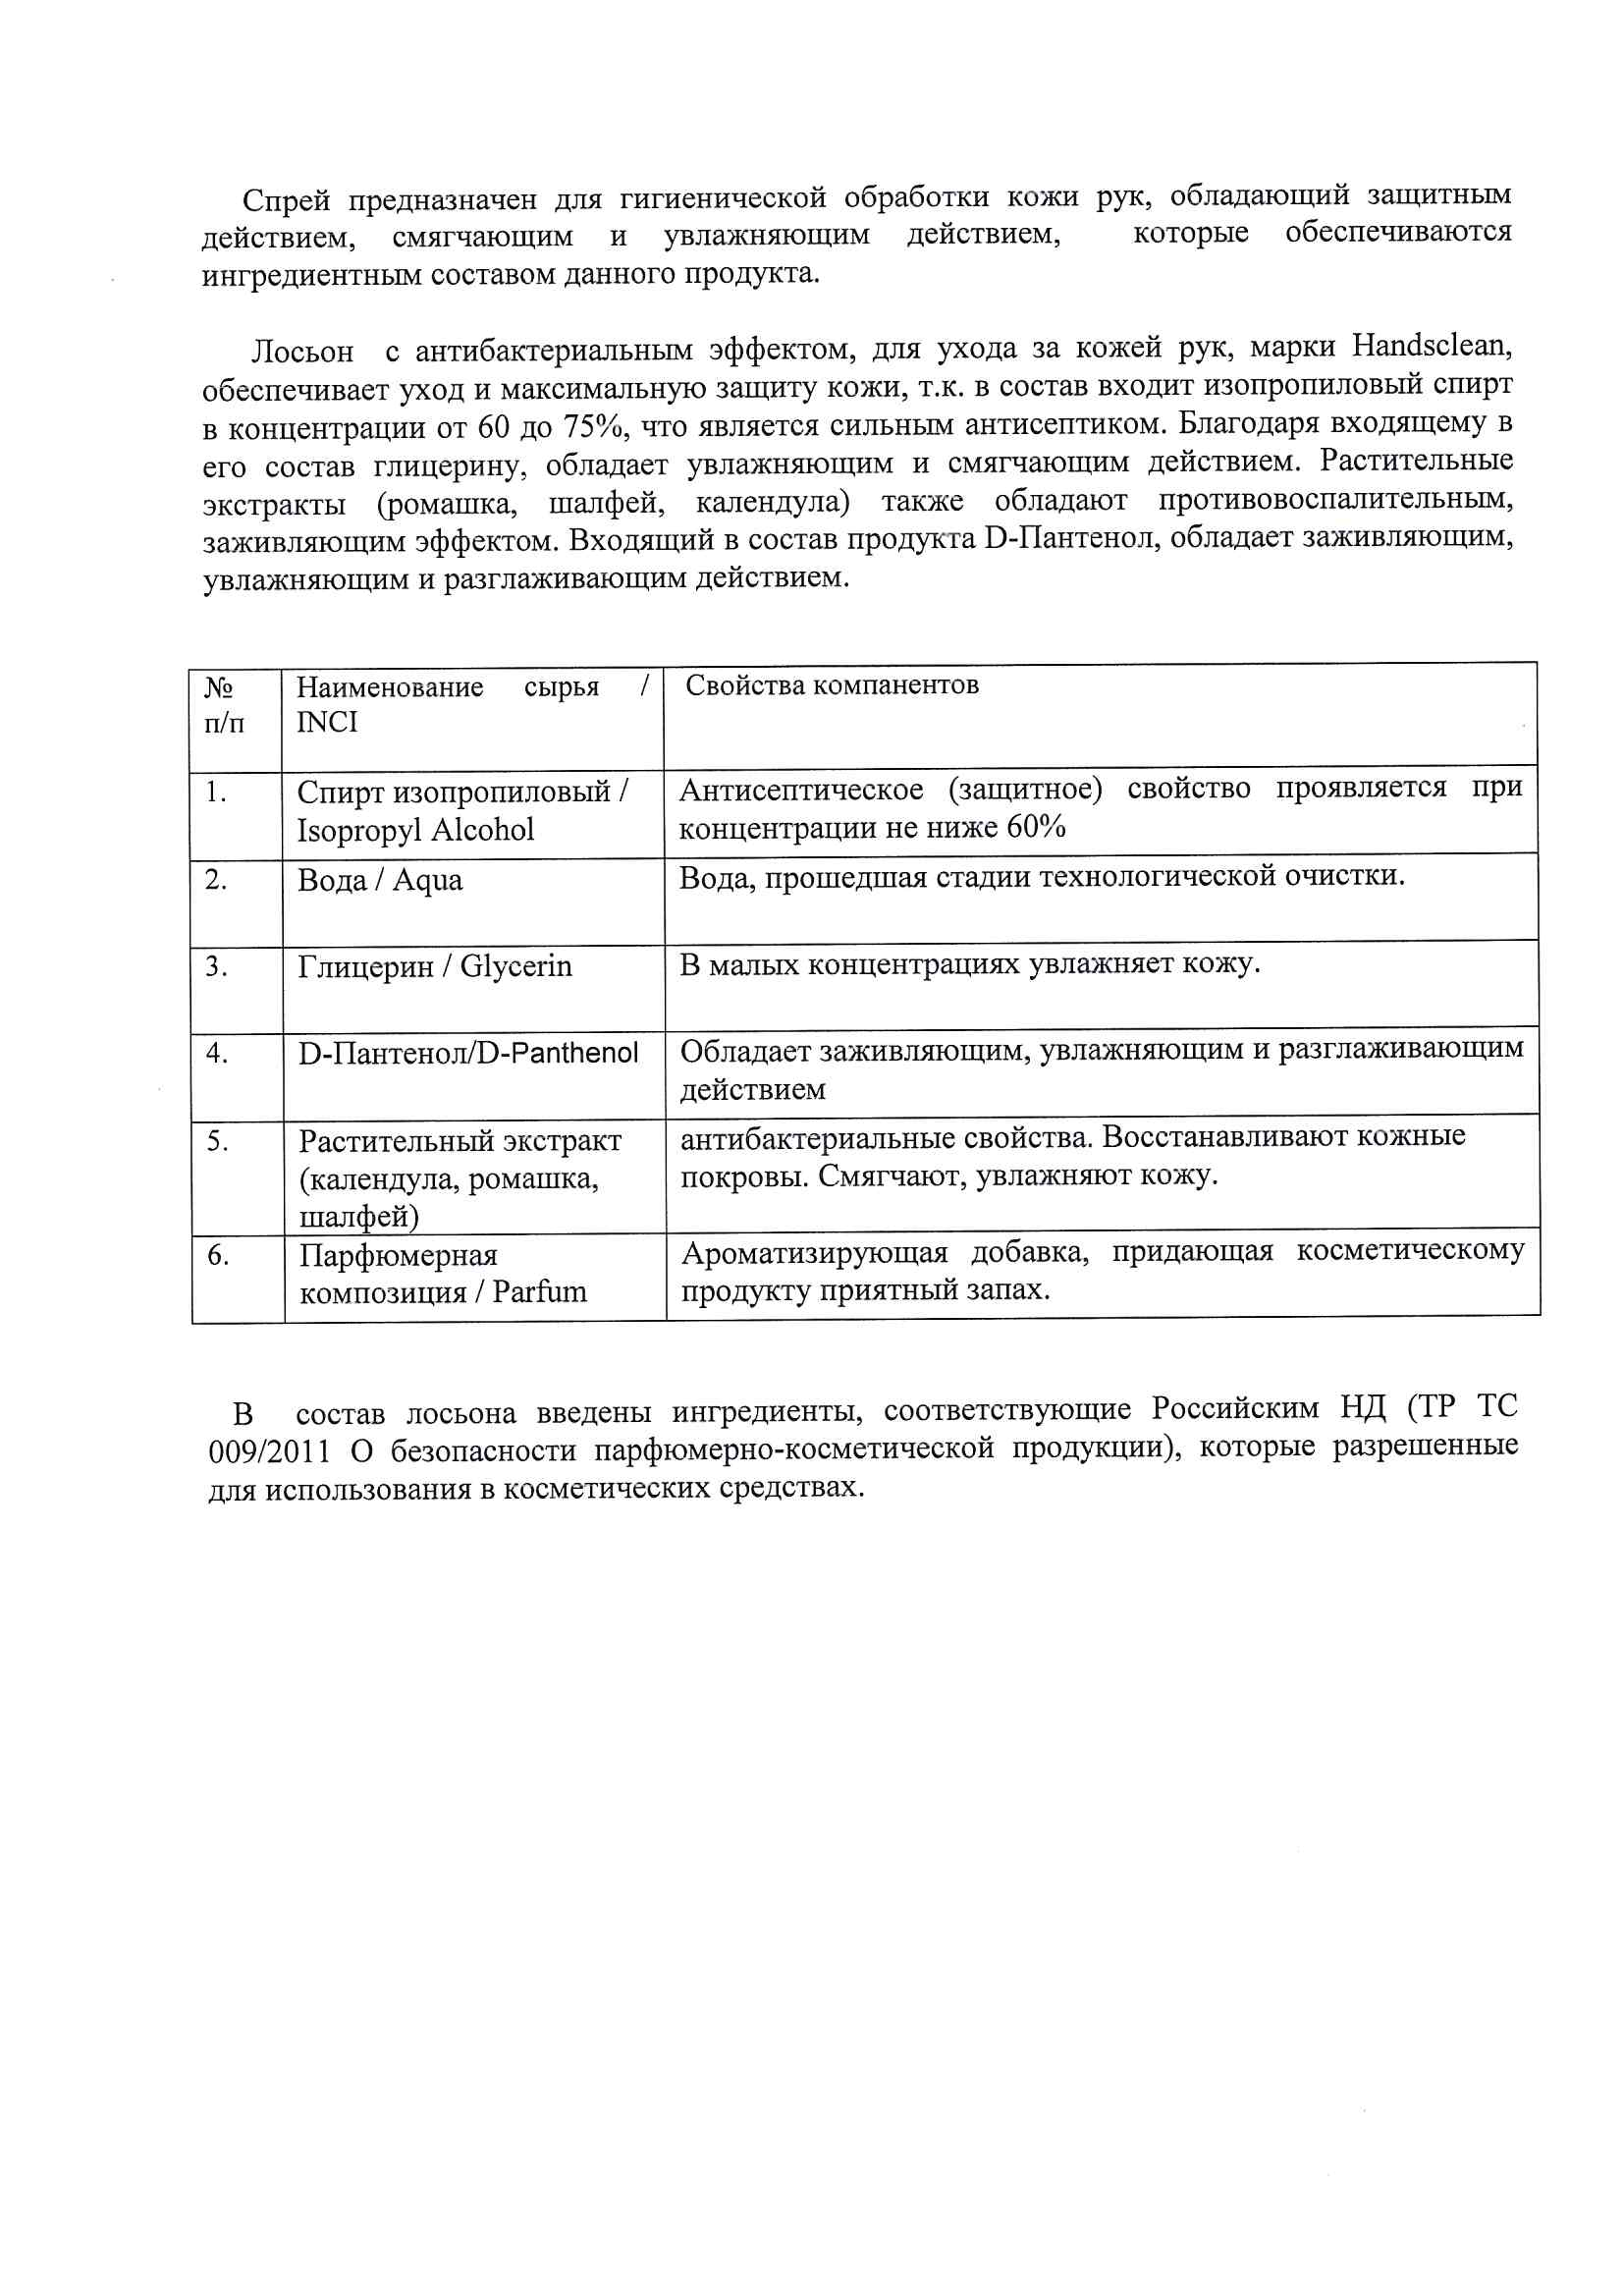 ООО ПКП «Т-КОСМЕТИКС»